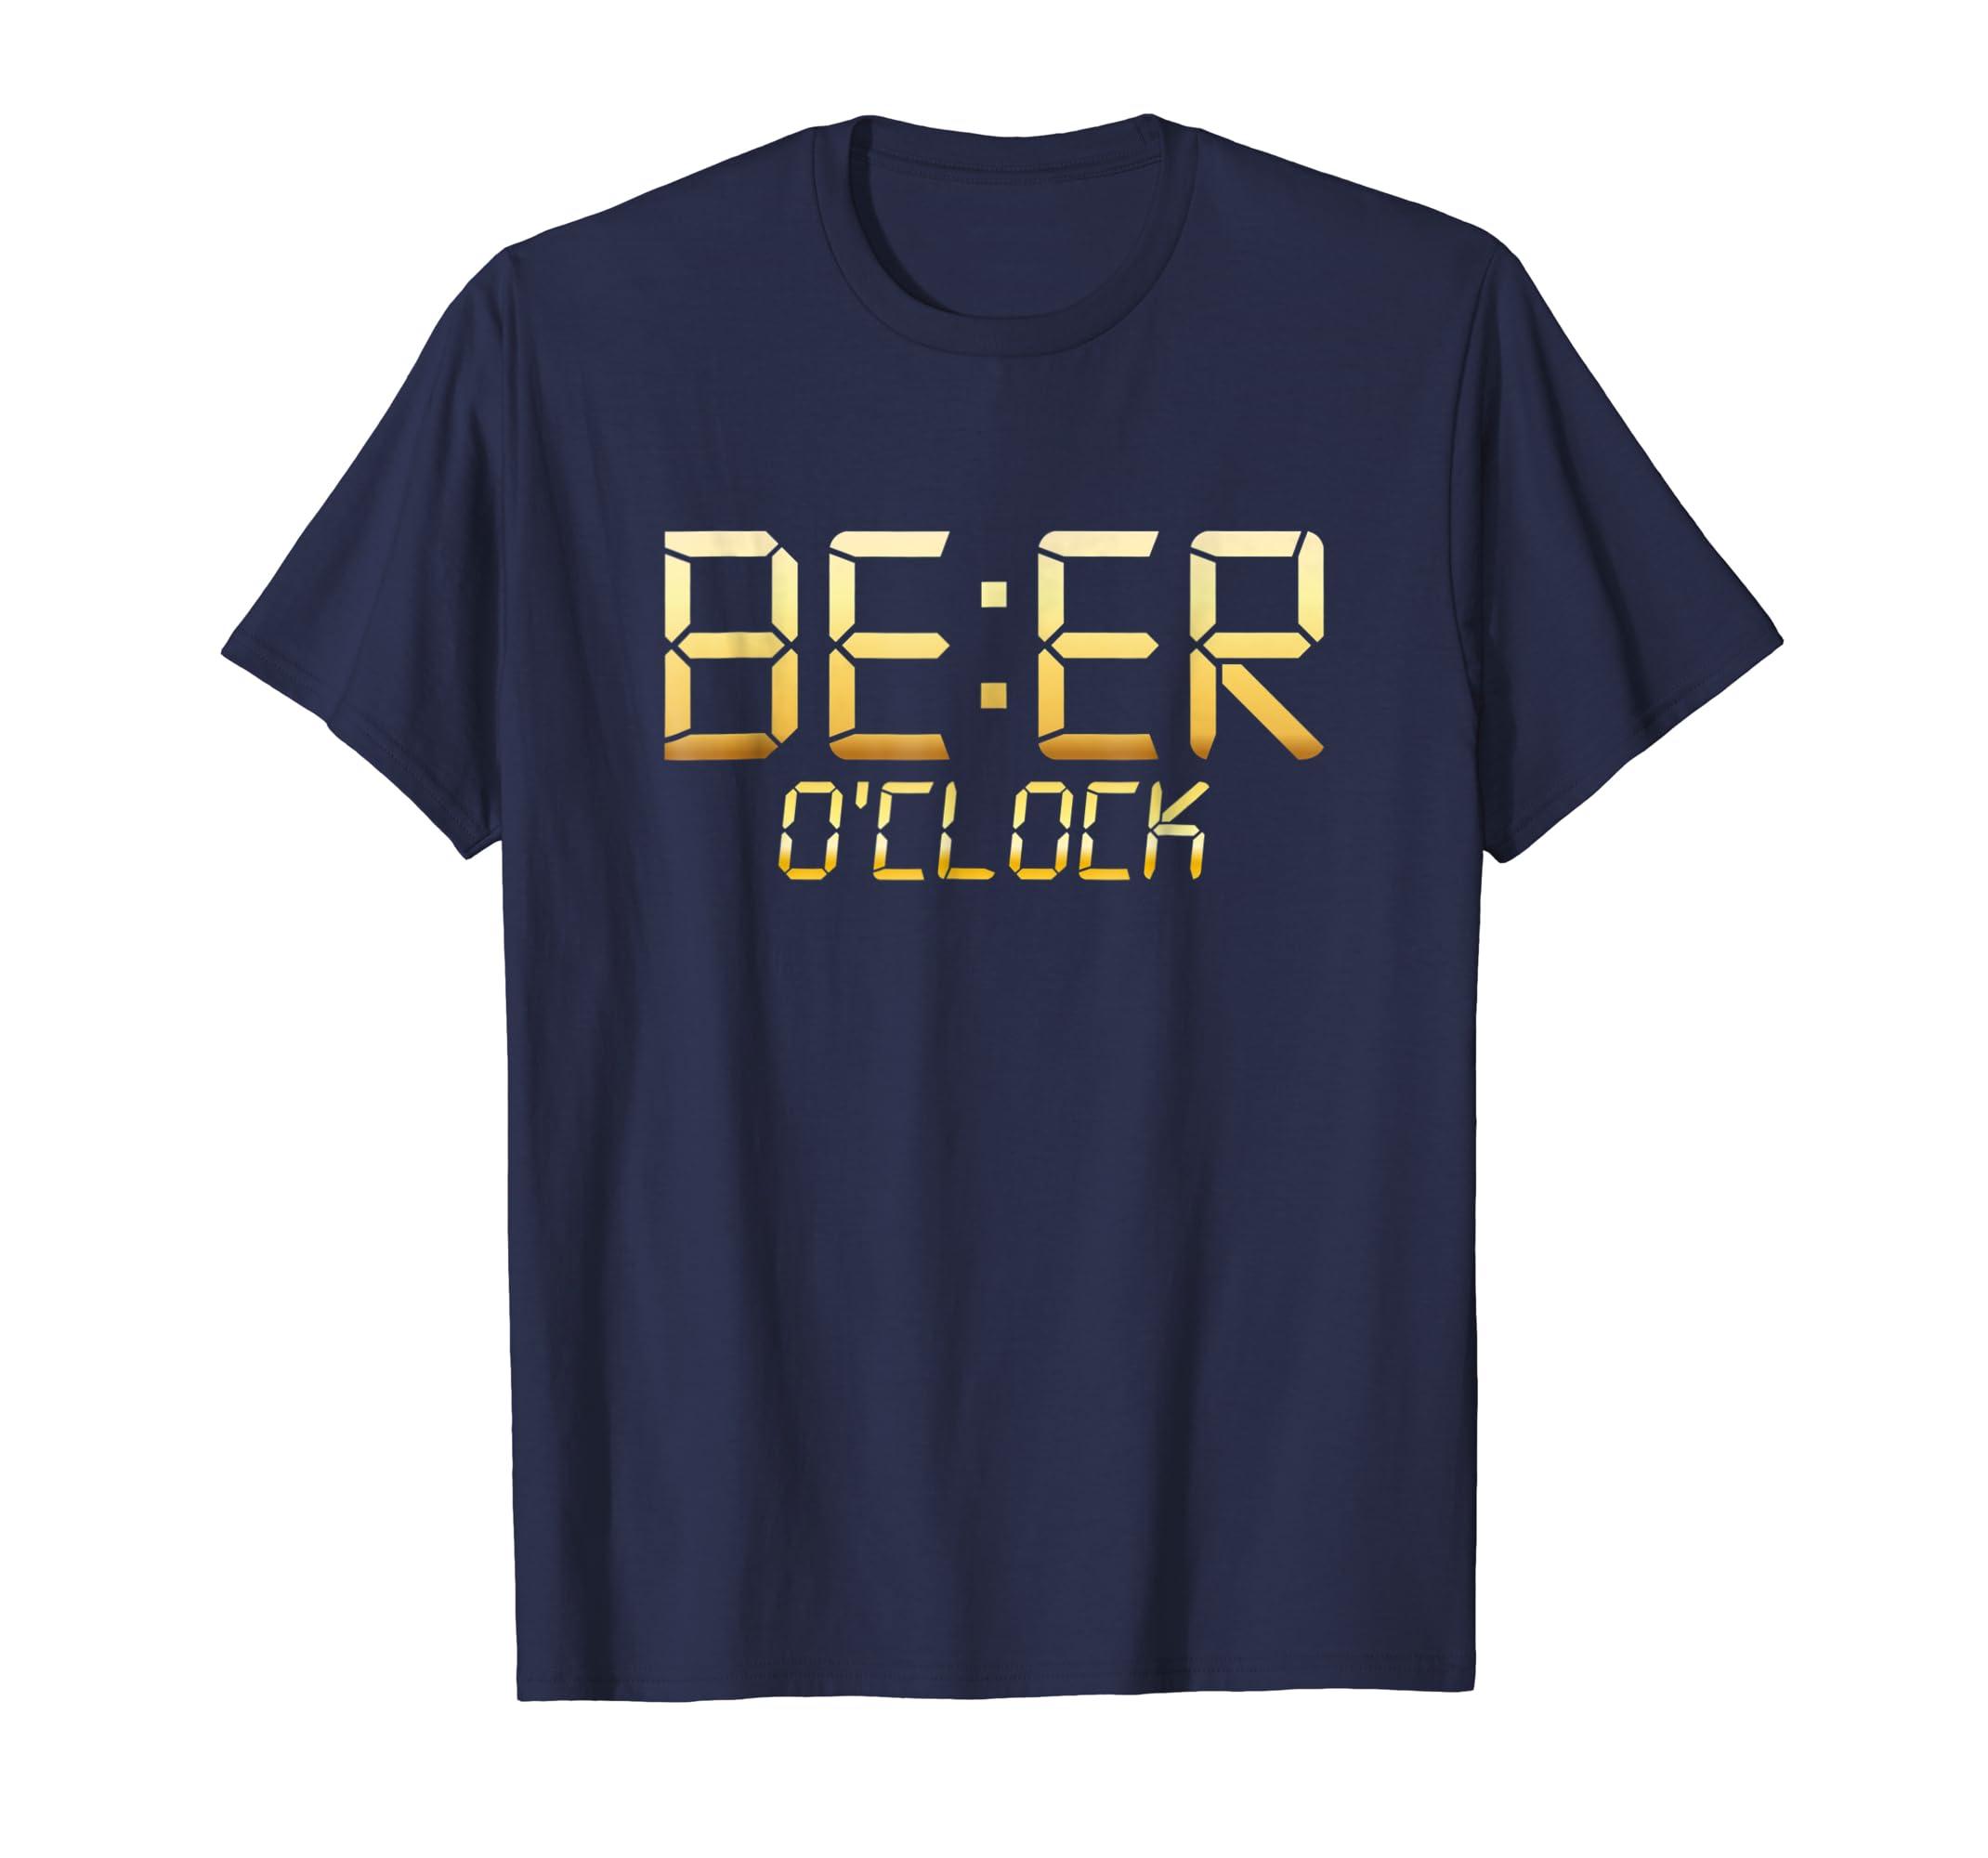 'BEER O'CLOCK' International Beer Day Drinking Beer Shirt-AZP